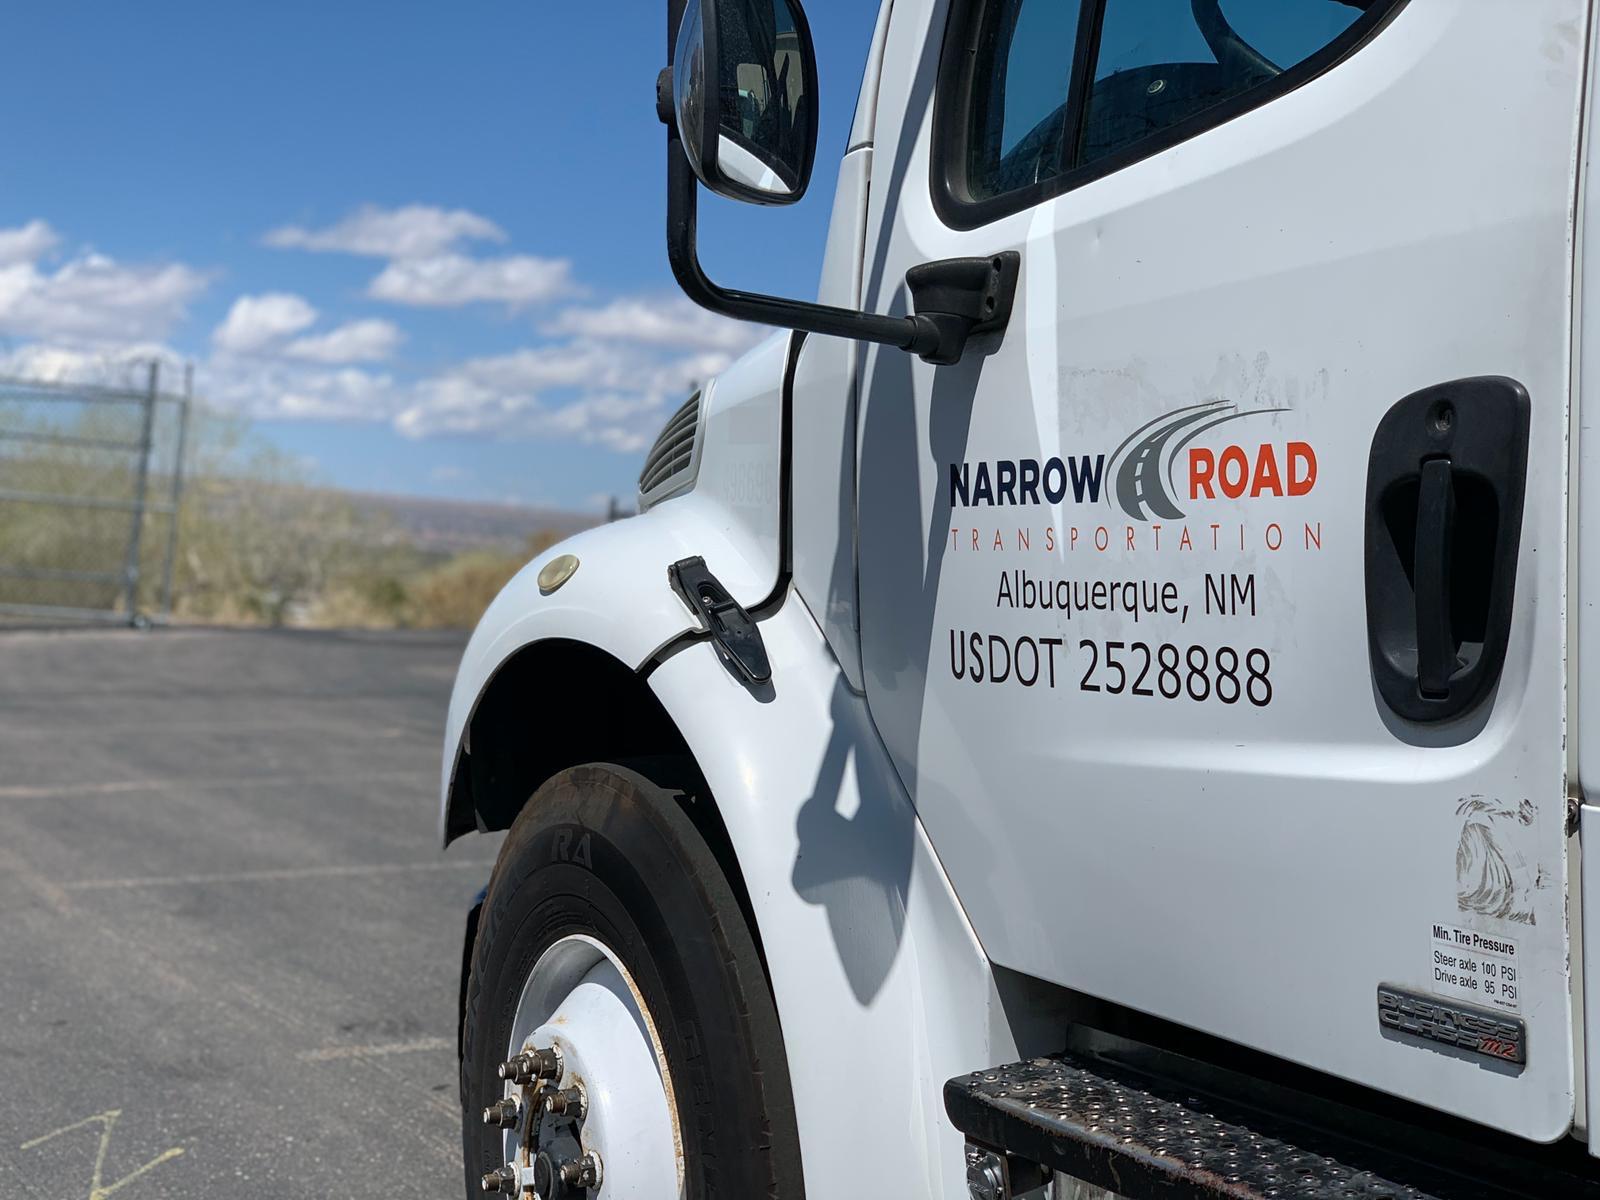 Narrow Road Truck